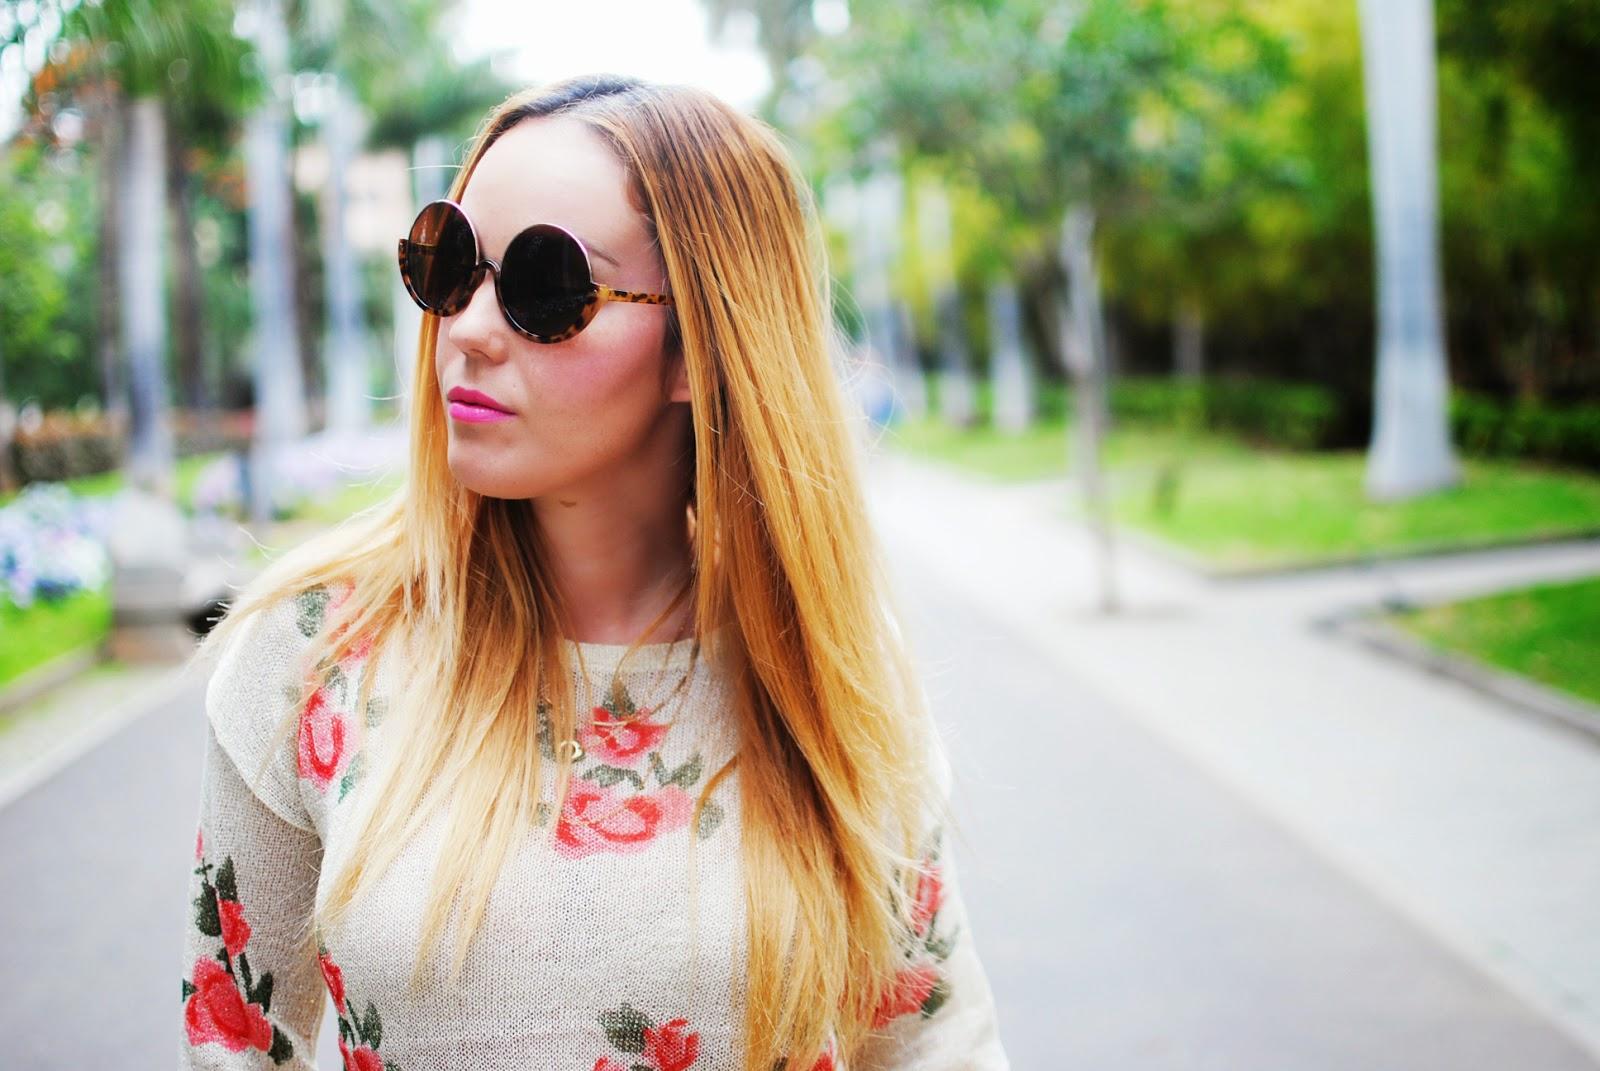 Nery Hdez, vjstyle, lovelyshoes, print floral, coachela look, zerouv sunglasses, zerouv bloggers